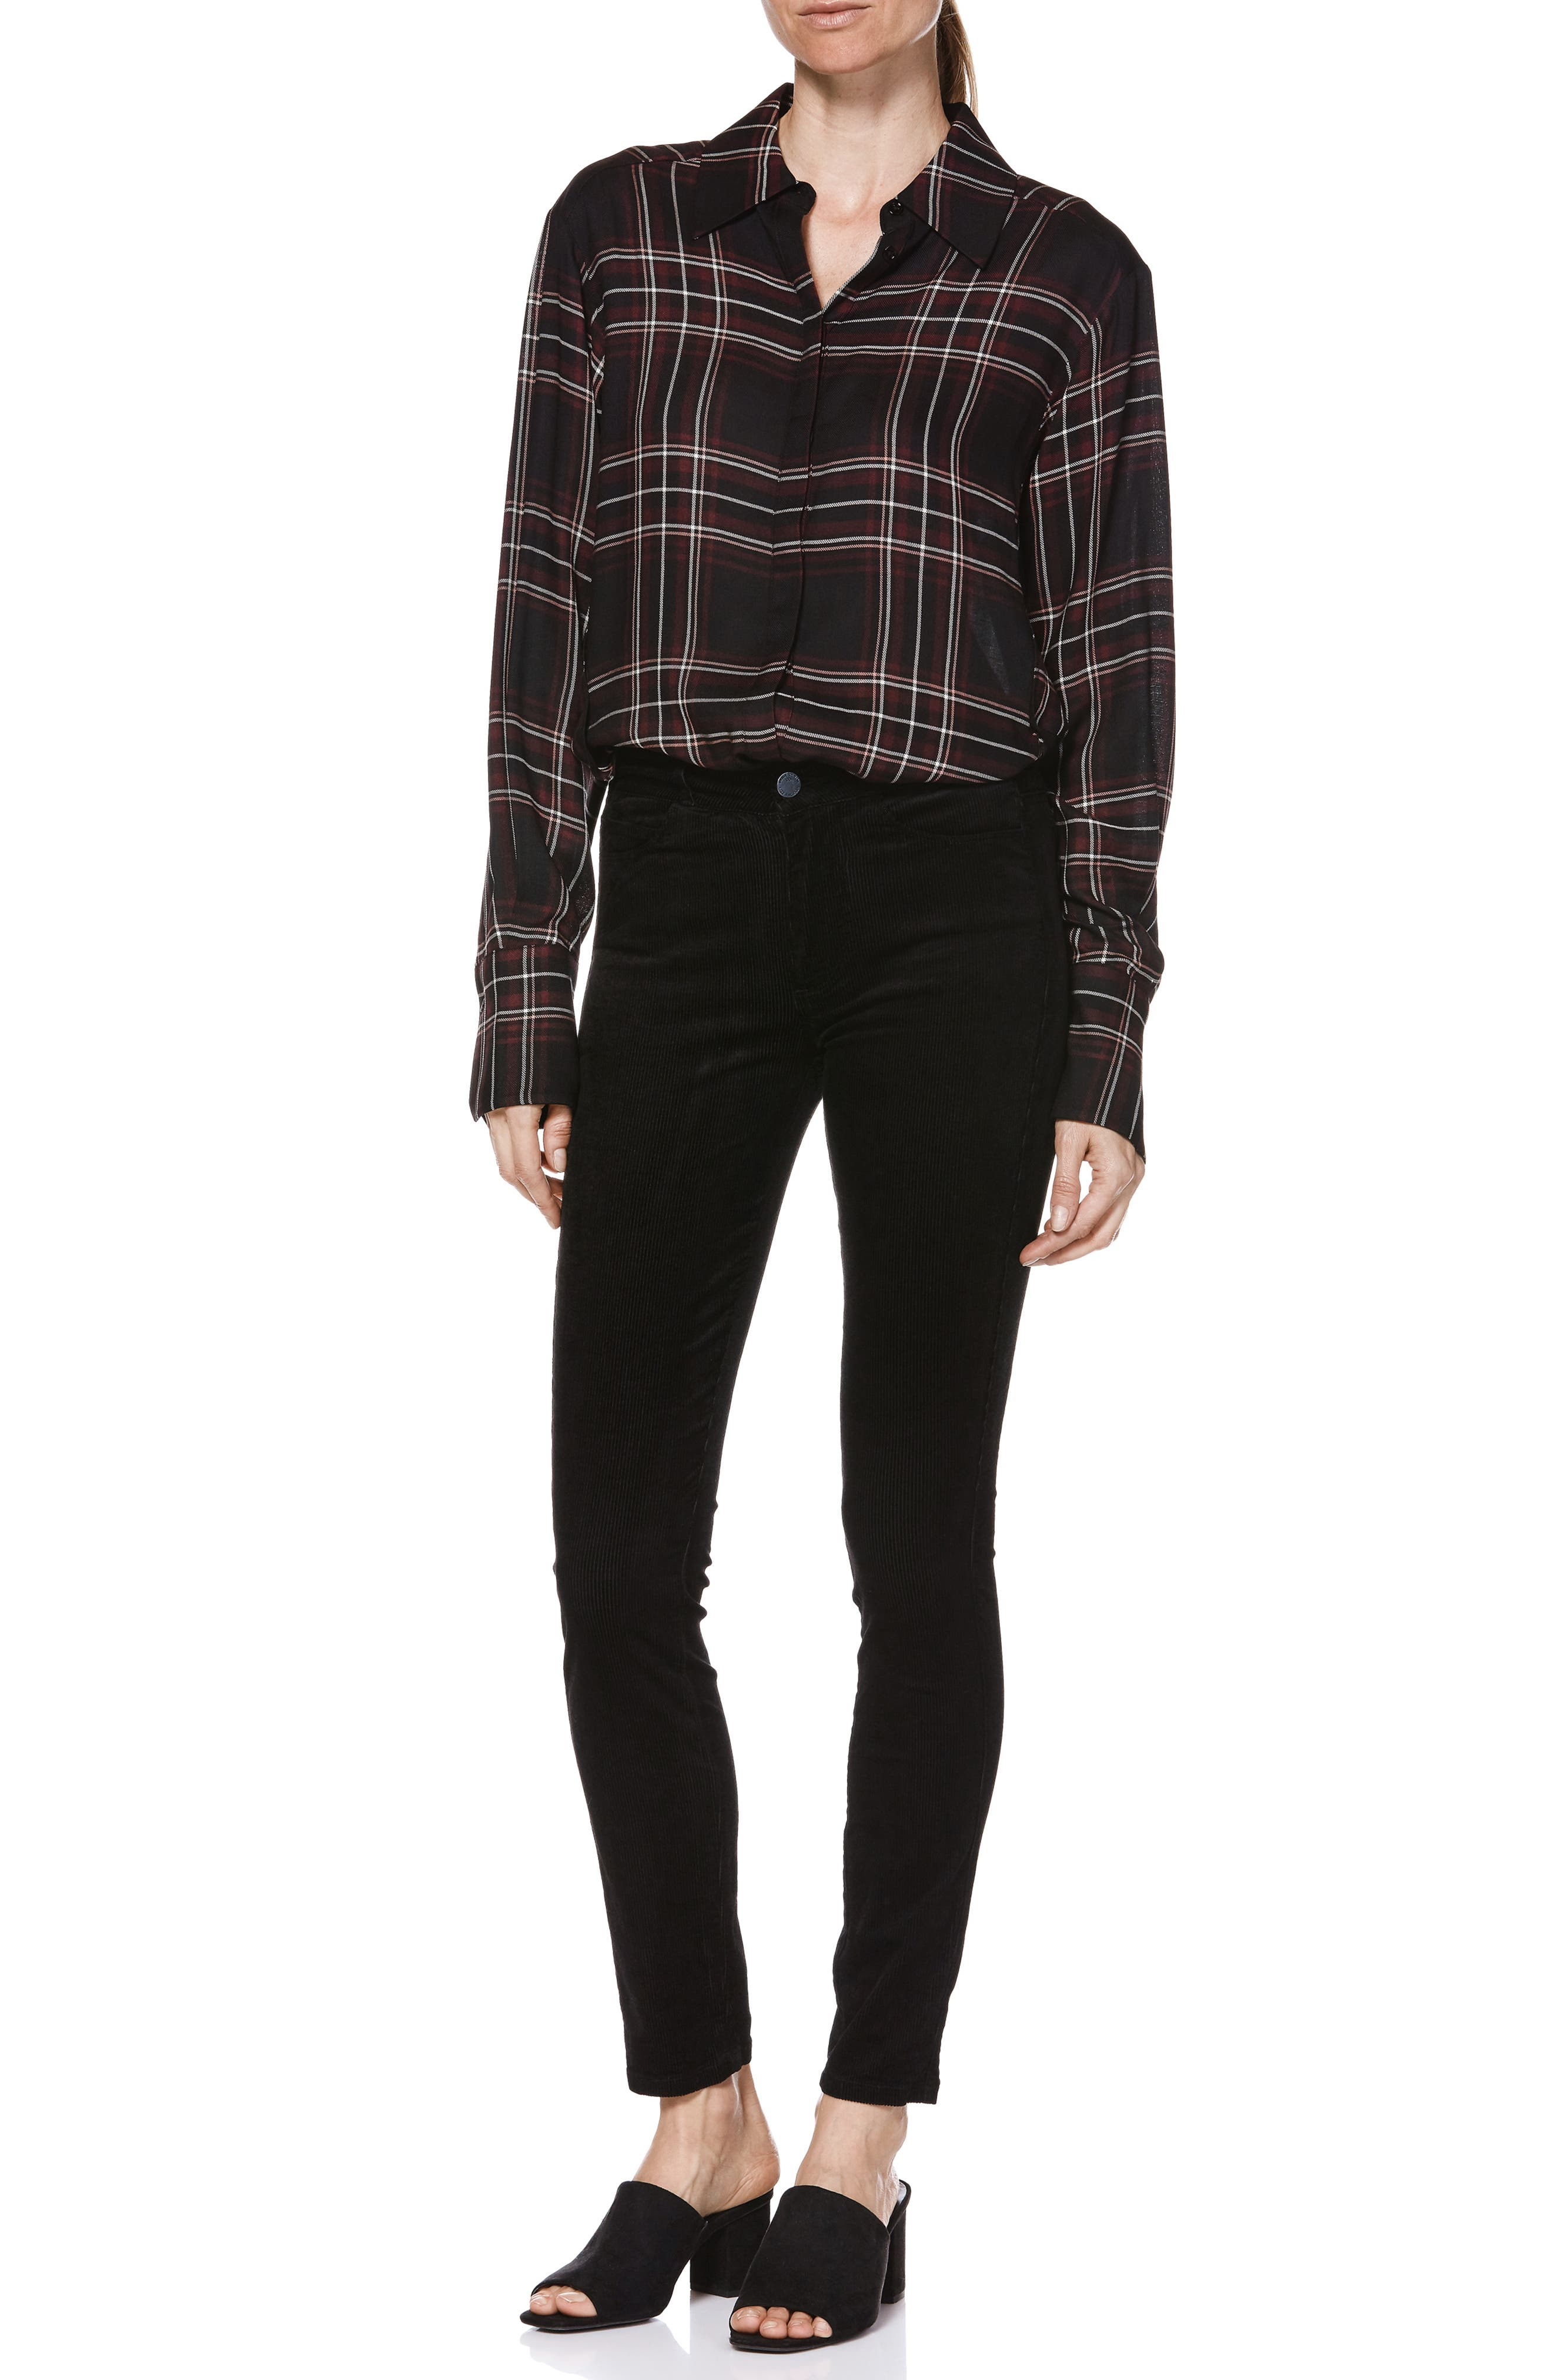 Transcend - Hoxton High Waist Ultra Skinny Jeans,                             Alternate thumbnail 6, color,                             001